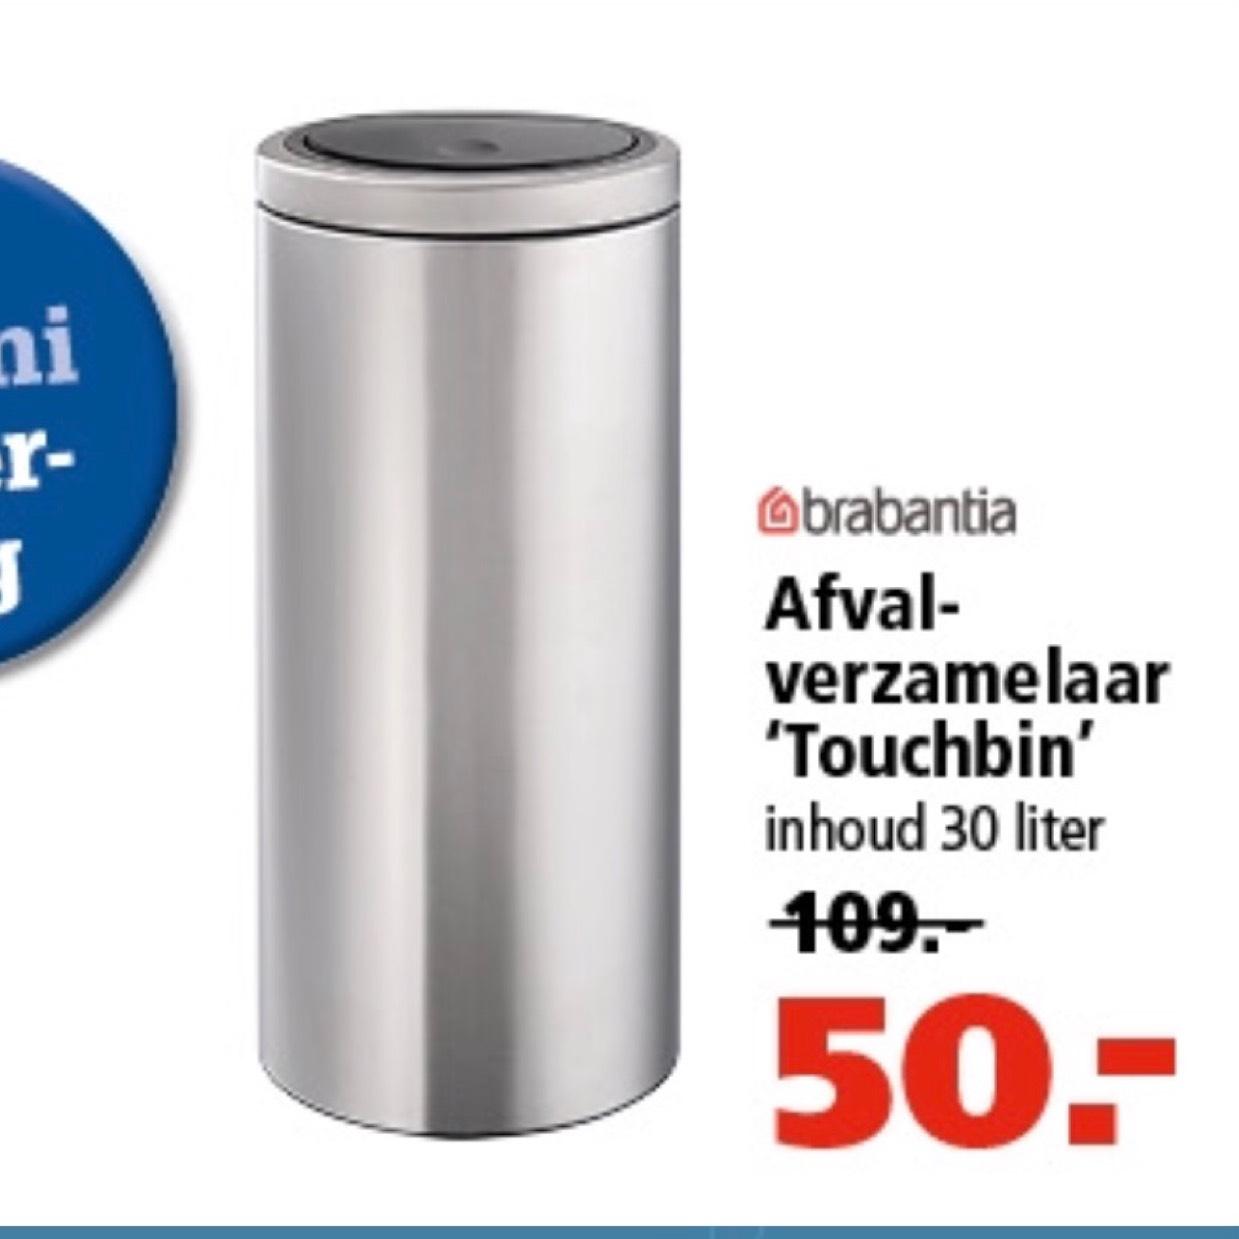 Brabantia Touchbin 30L RVS voor €50 @ Marskramer